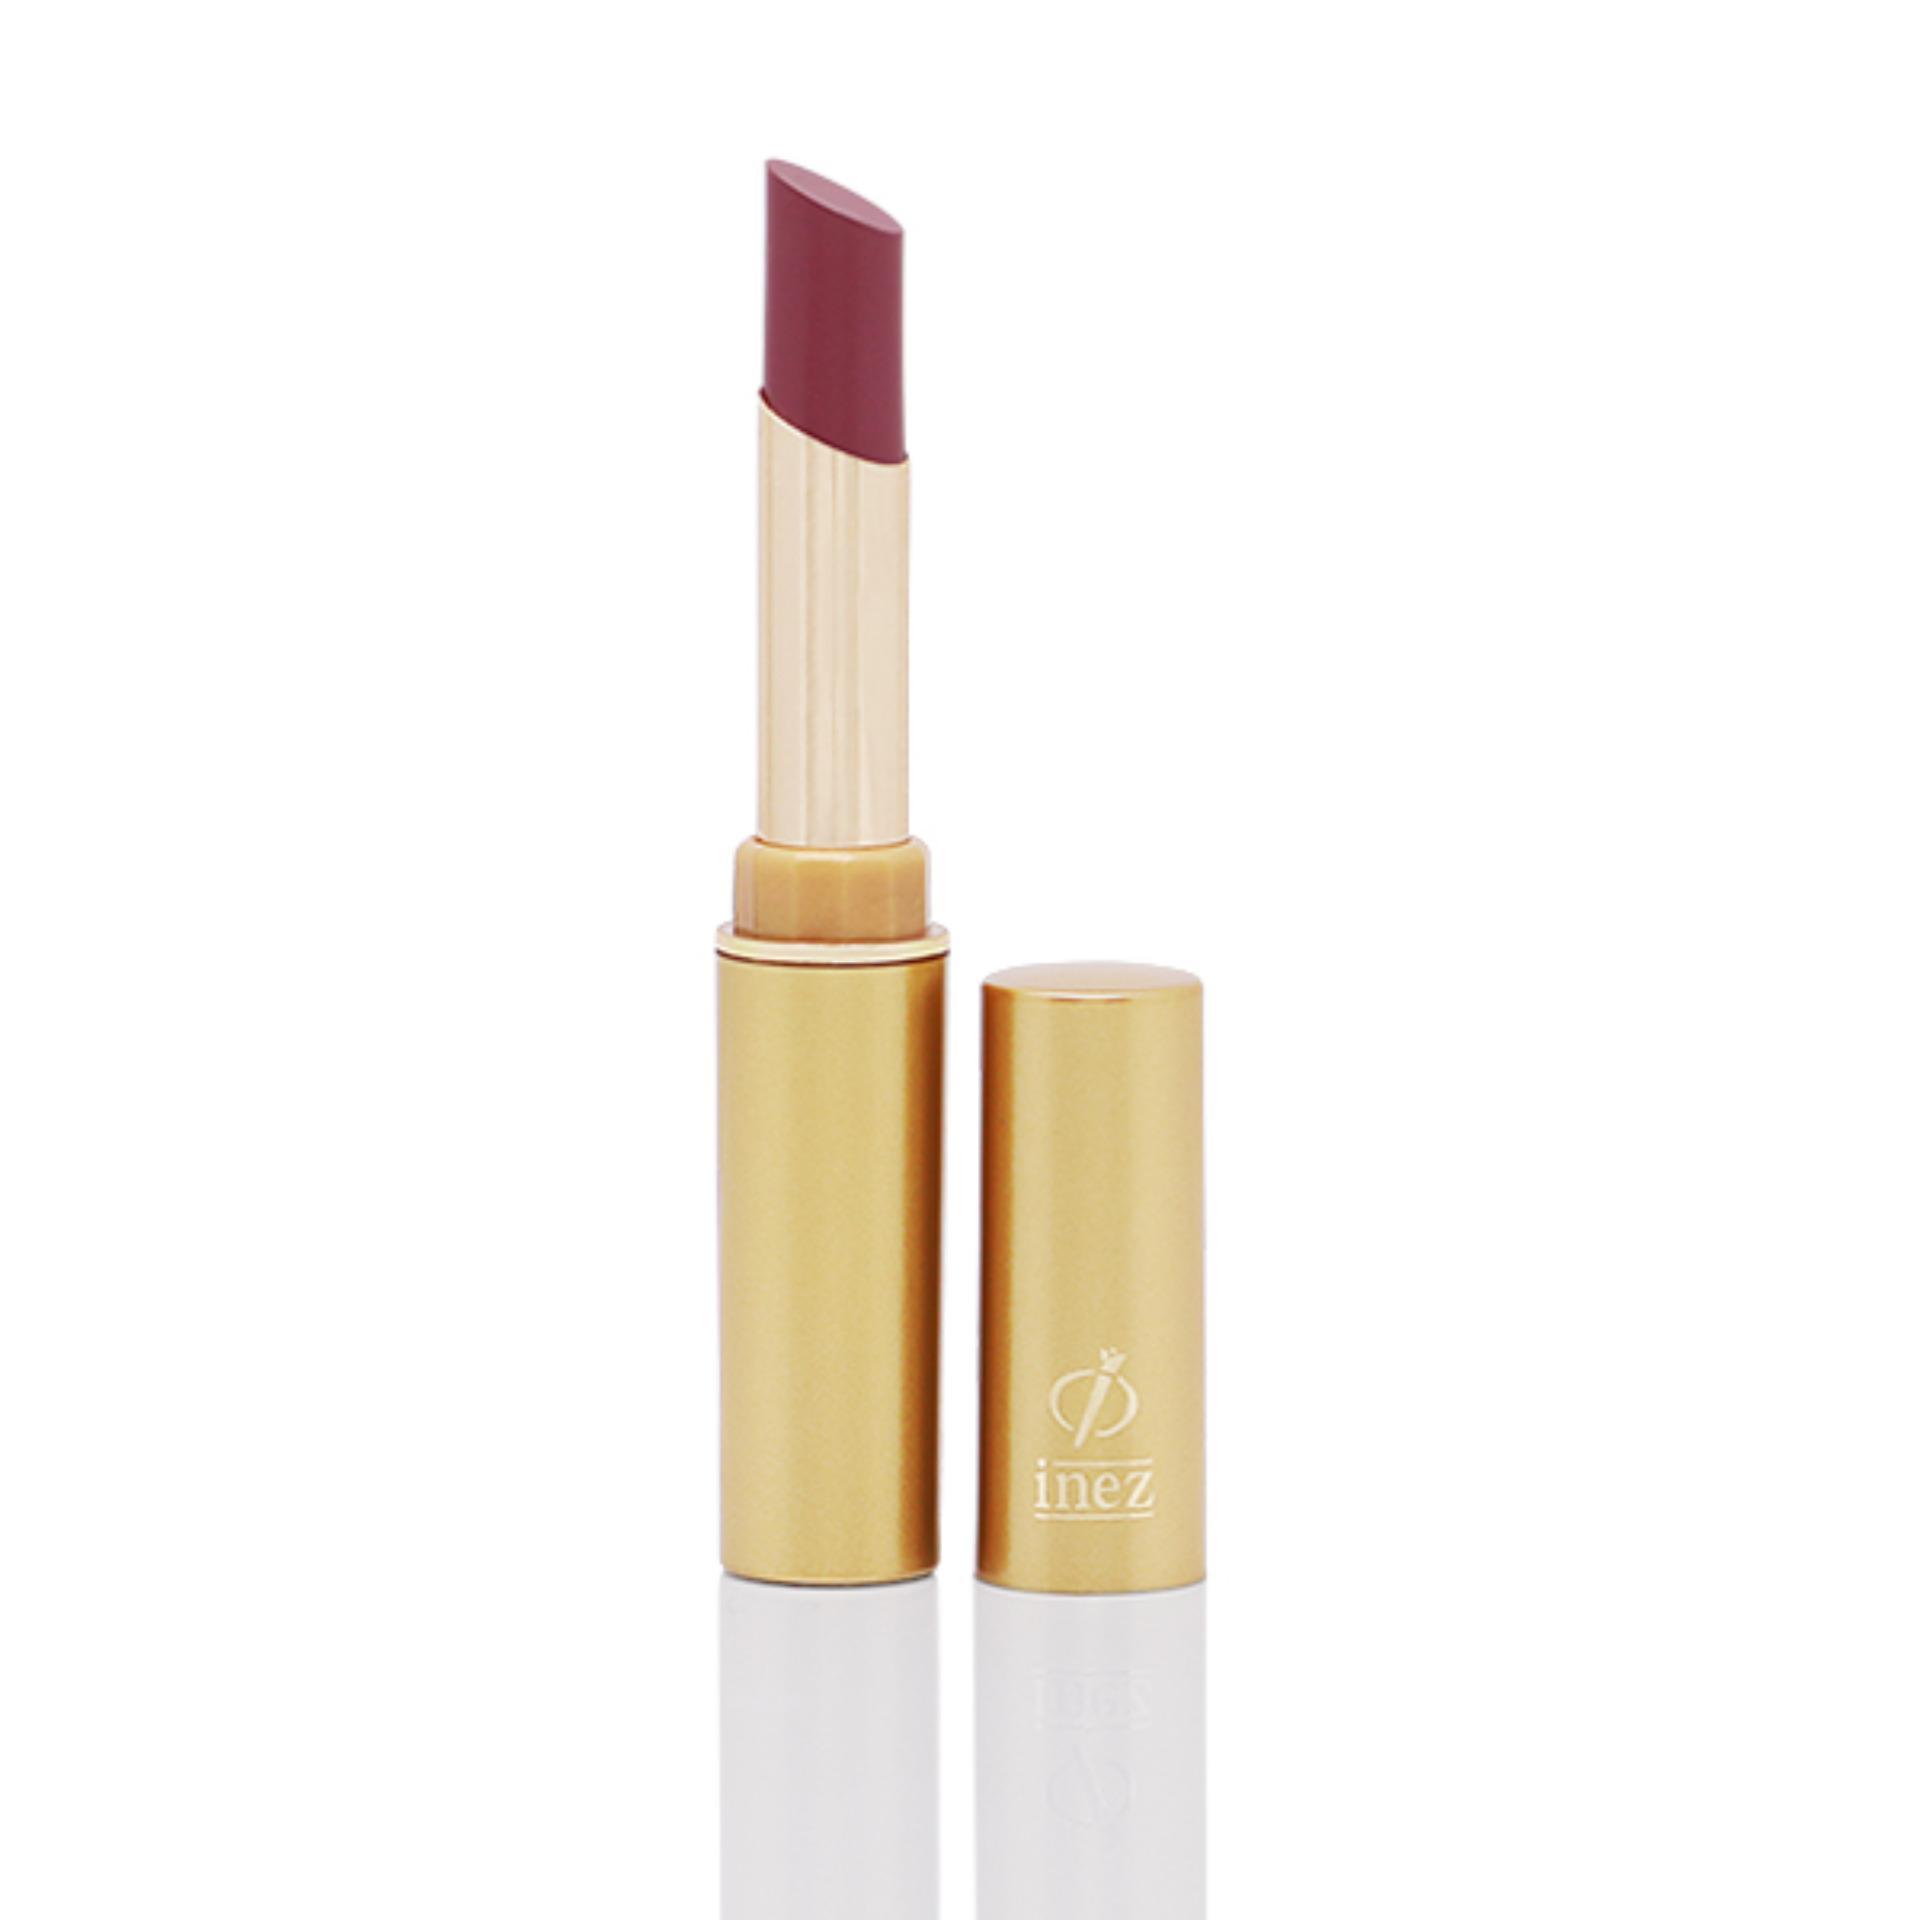 Inez Perfect Glow Matte Lipstick - Apple Blossom